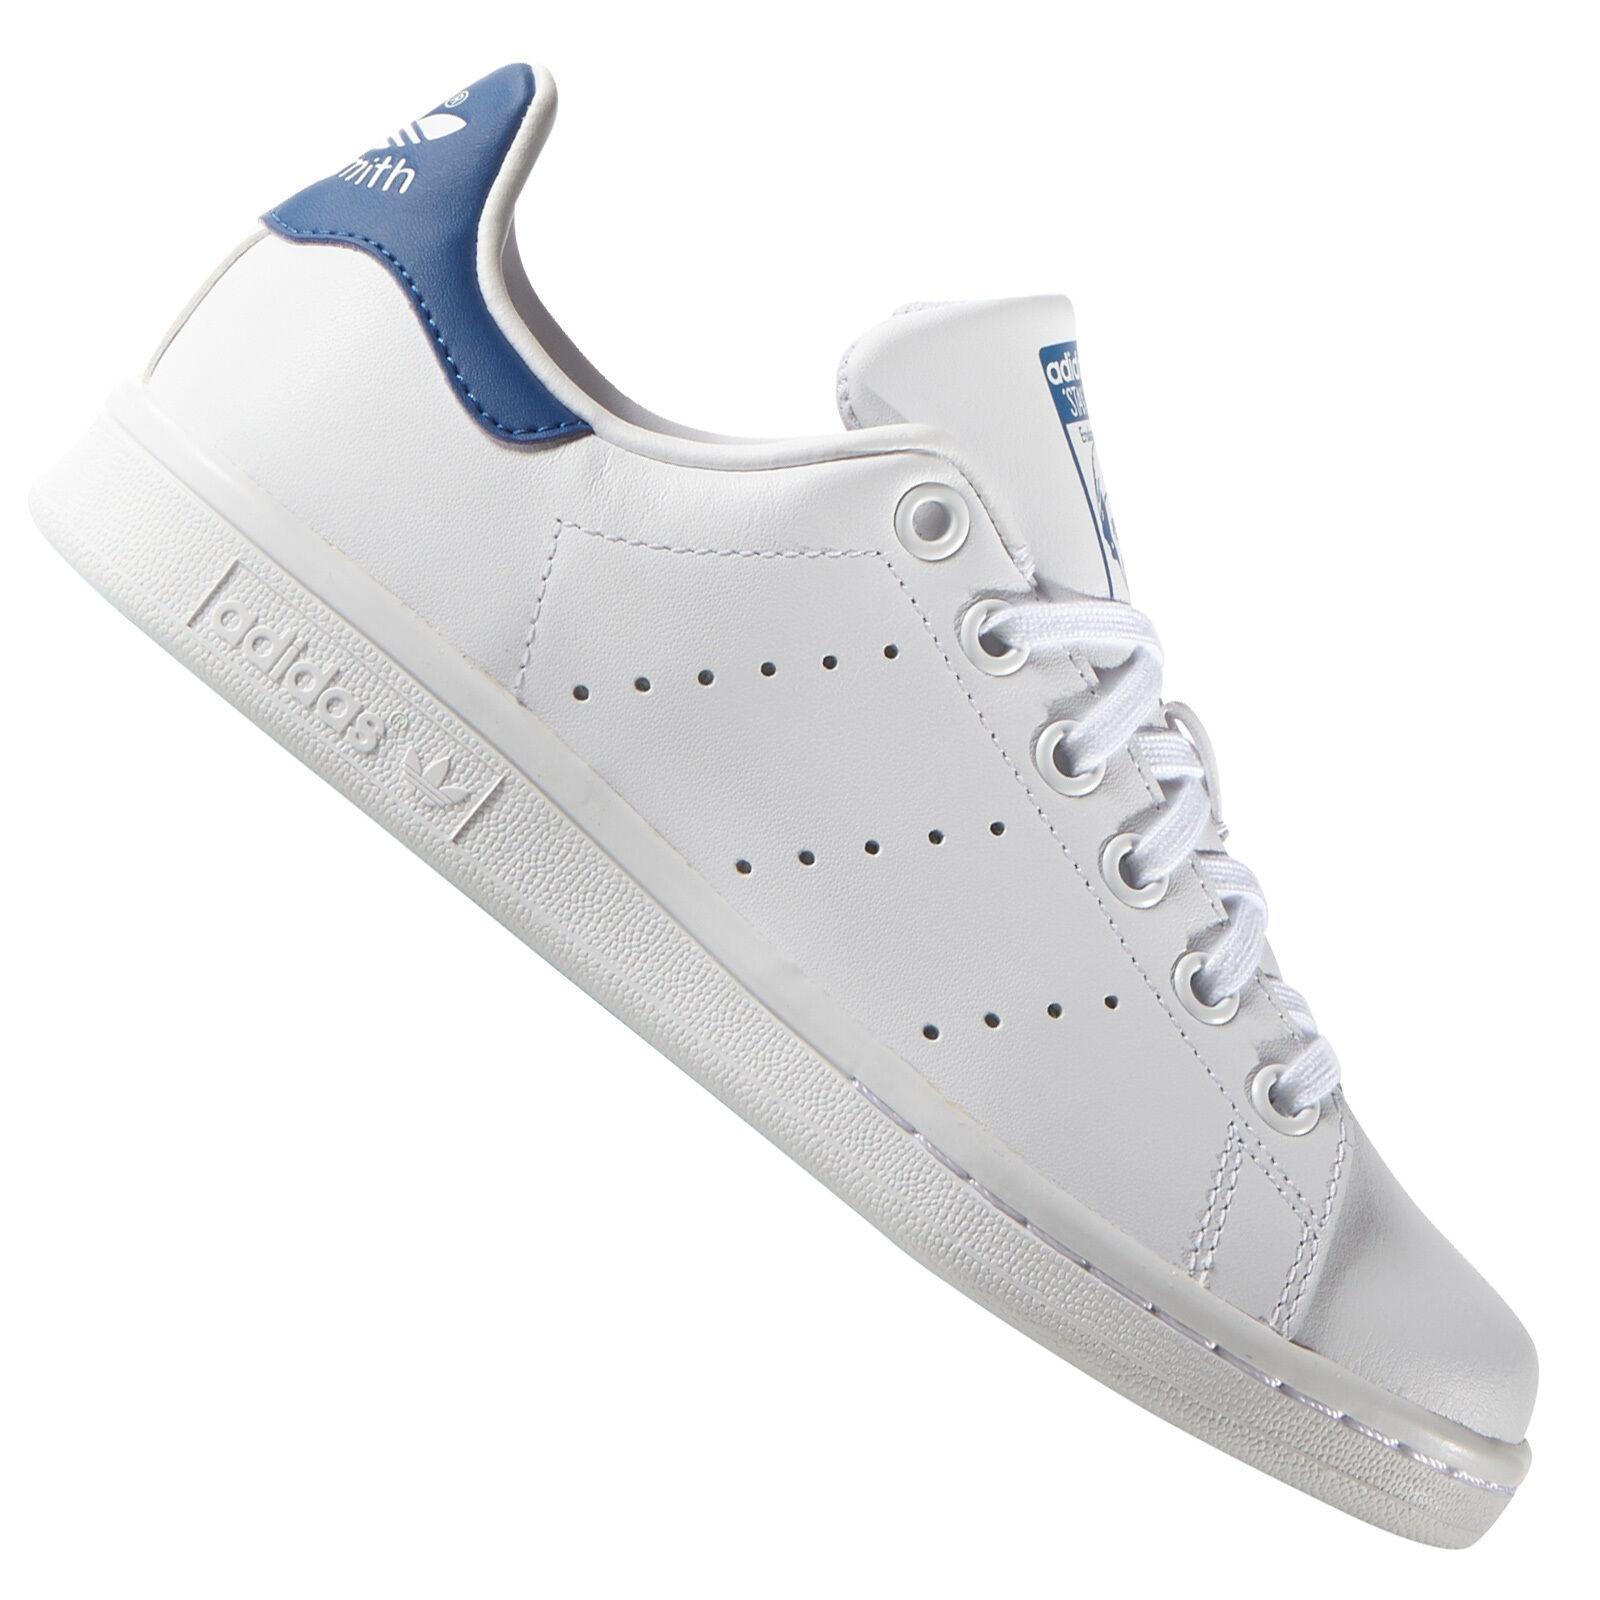 Adidas Chaussures Originals Stan Smith Smith Stan S74778 Baskets Bleues Blanc cb45ab